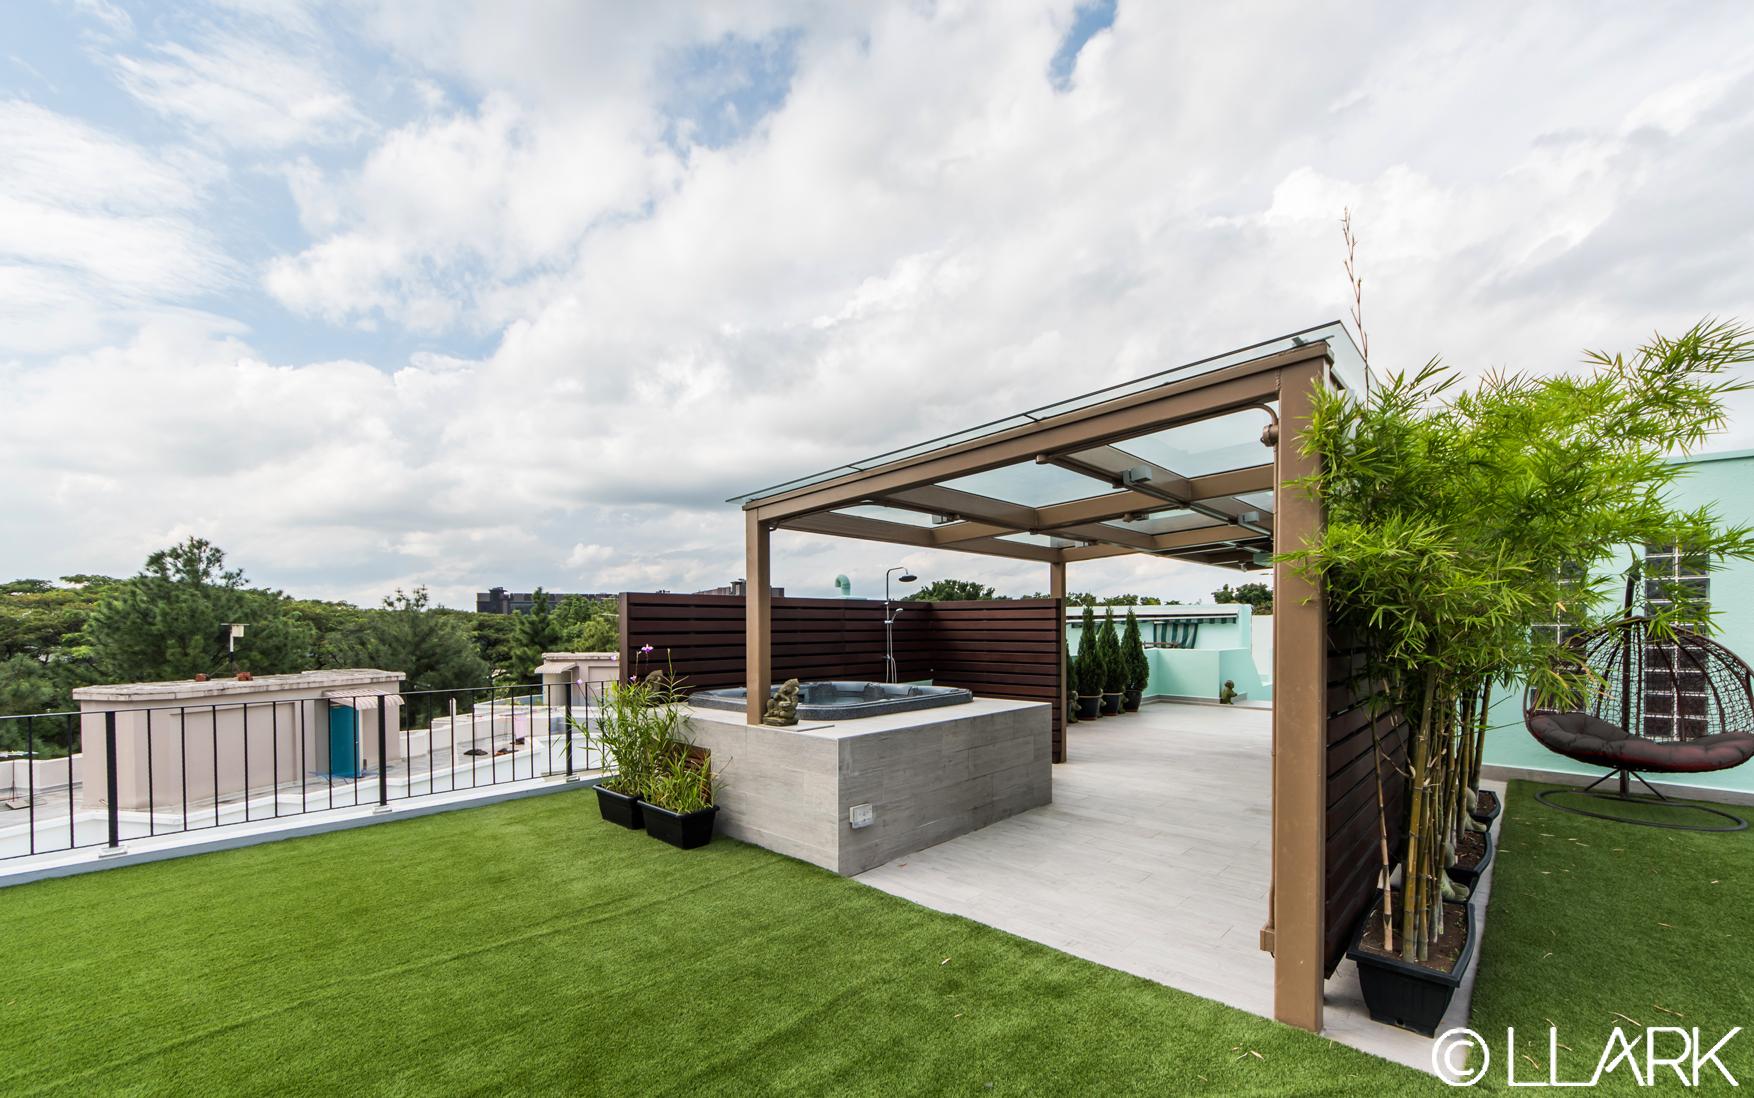 CV_Roof Terrace 02.jpg